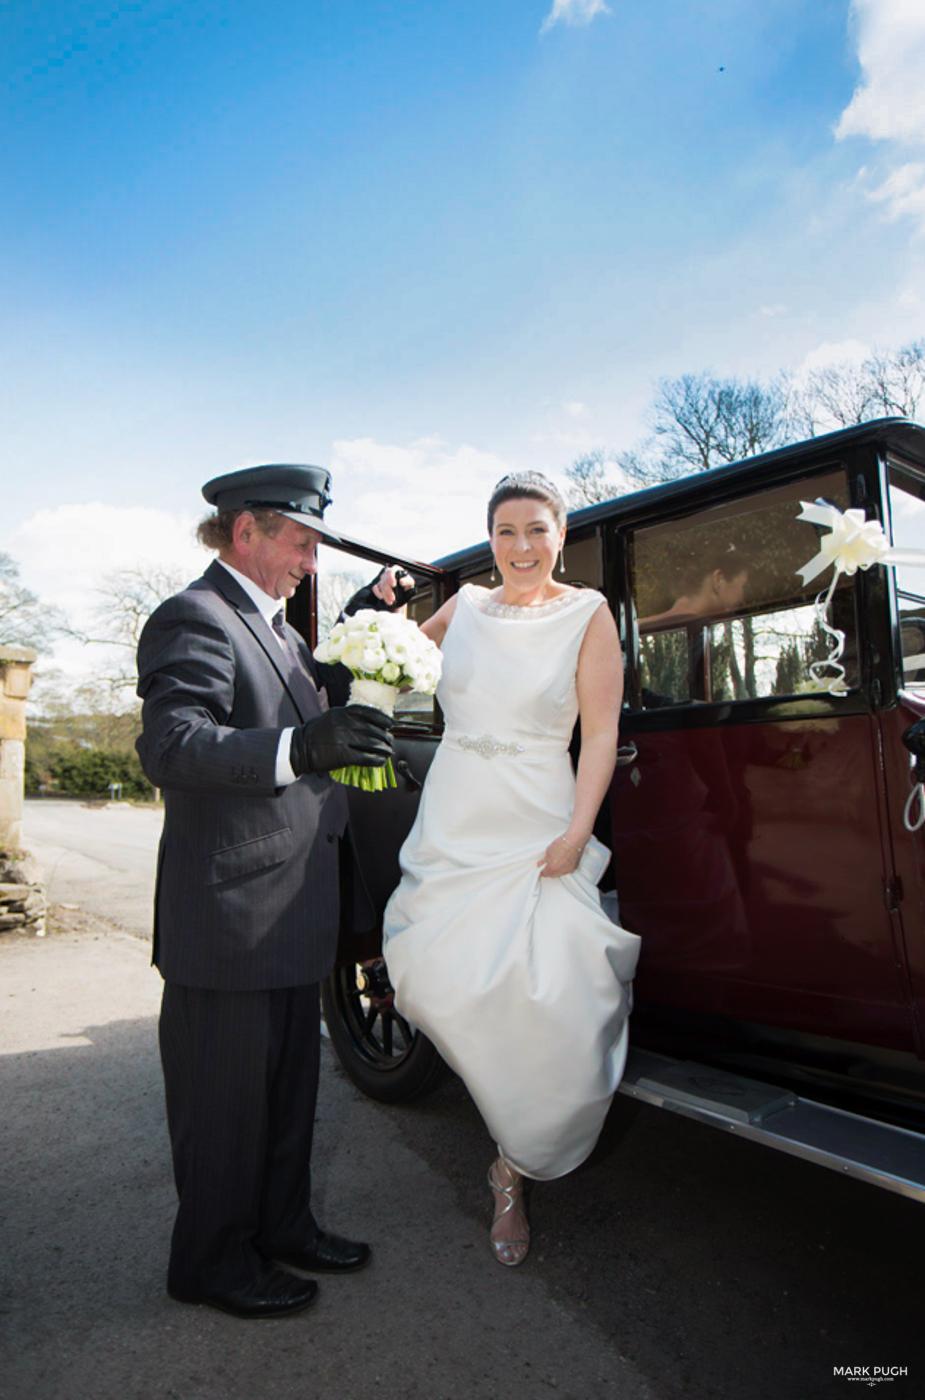 039  - Helen and Tim - Wedding Photography at Chatsworth House Bakewell Derbyshire DE45 1PP - Wedding Photographer Mark Pugh www.markpugh.com -113.JPG